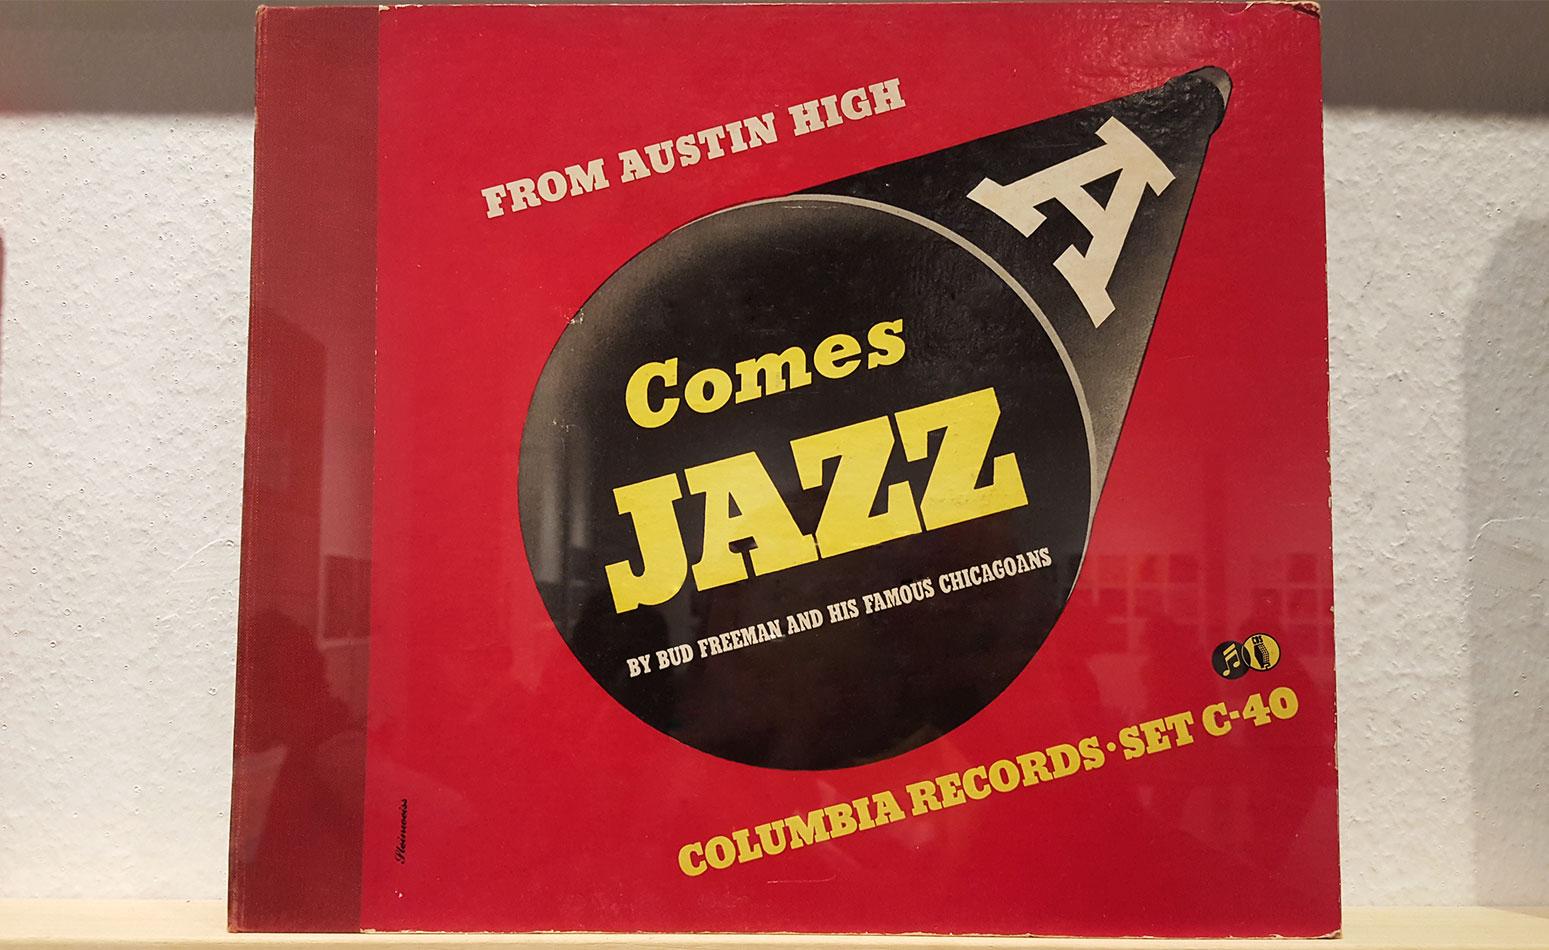 comes_jazz_4_vinilygrafica